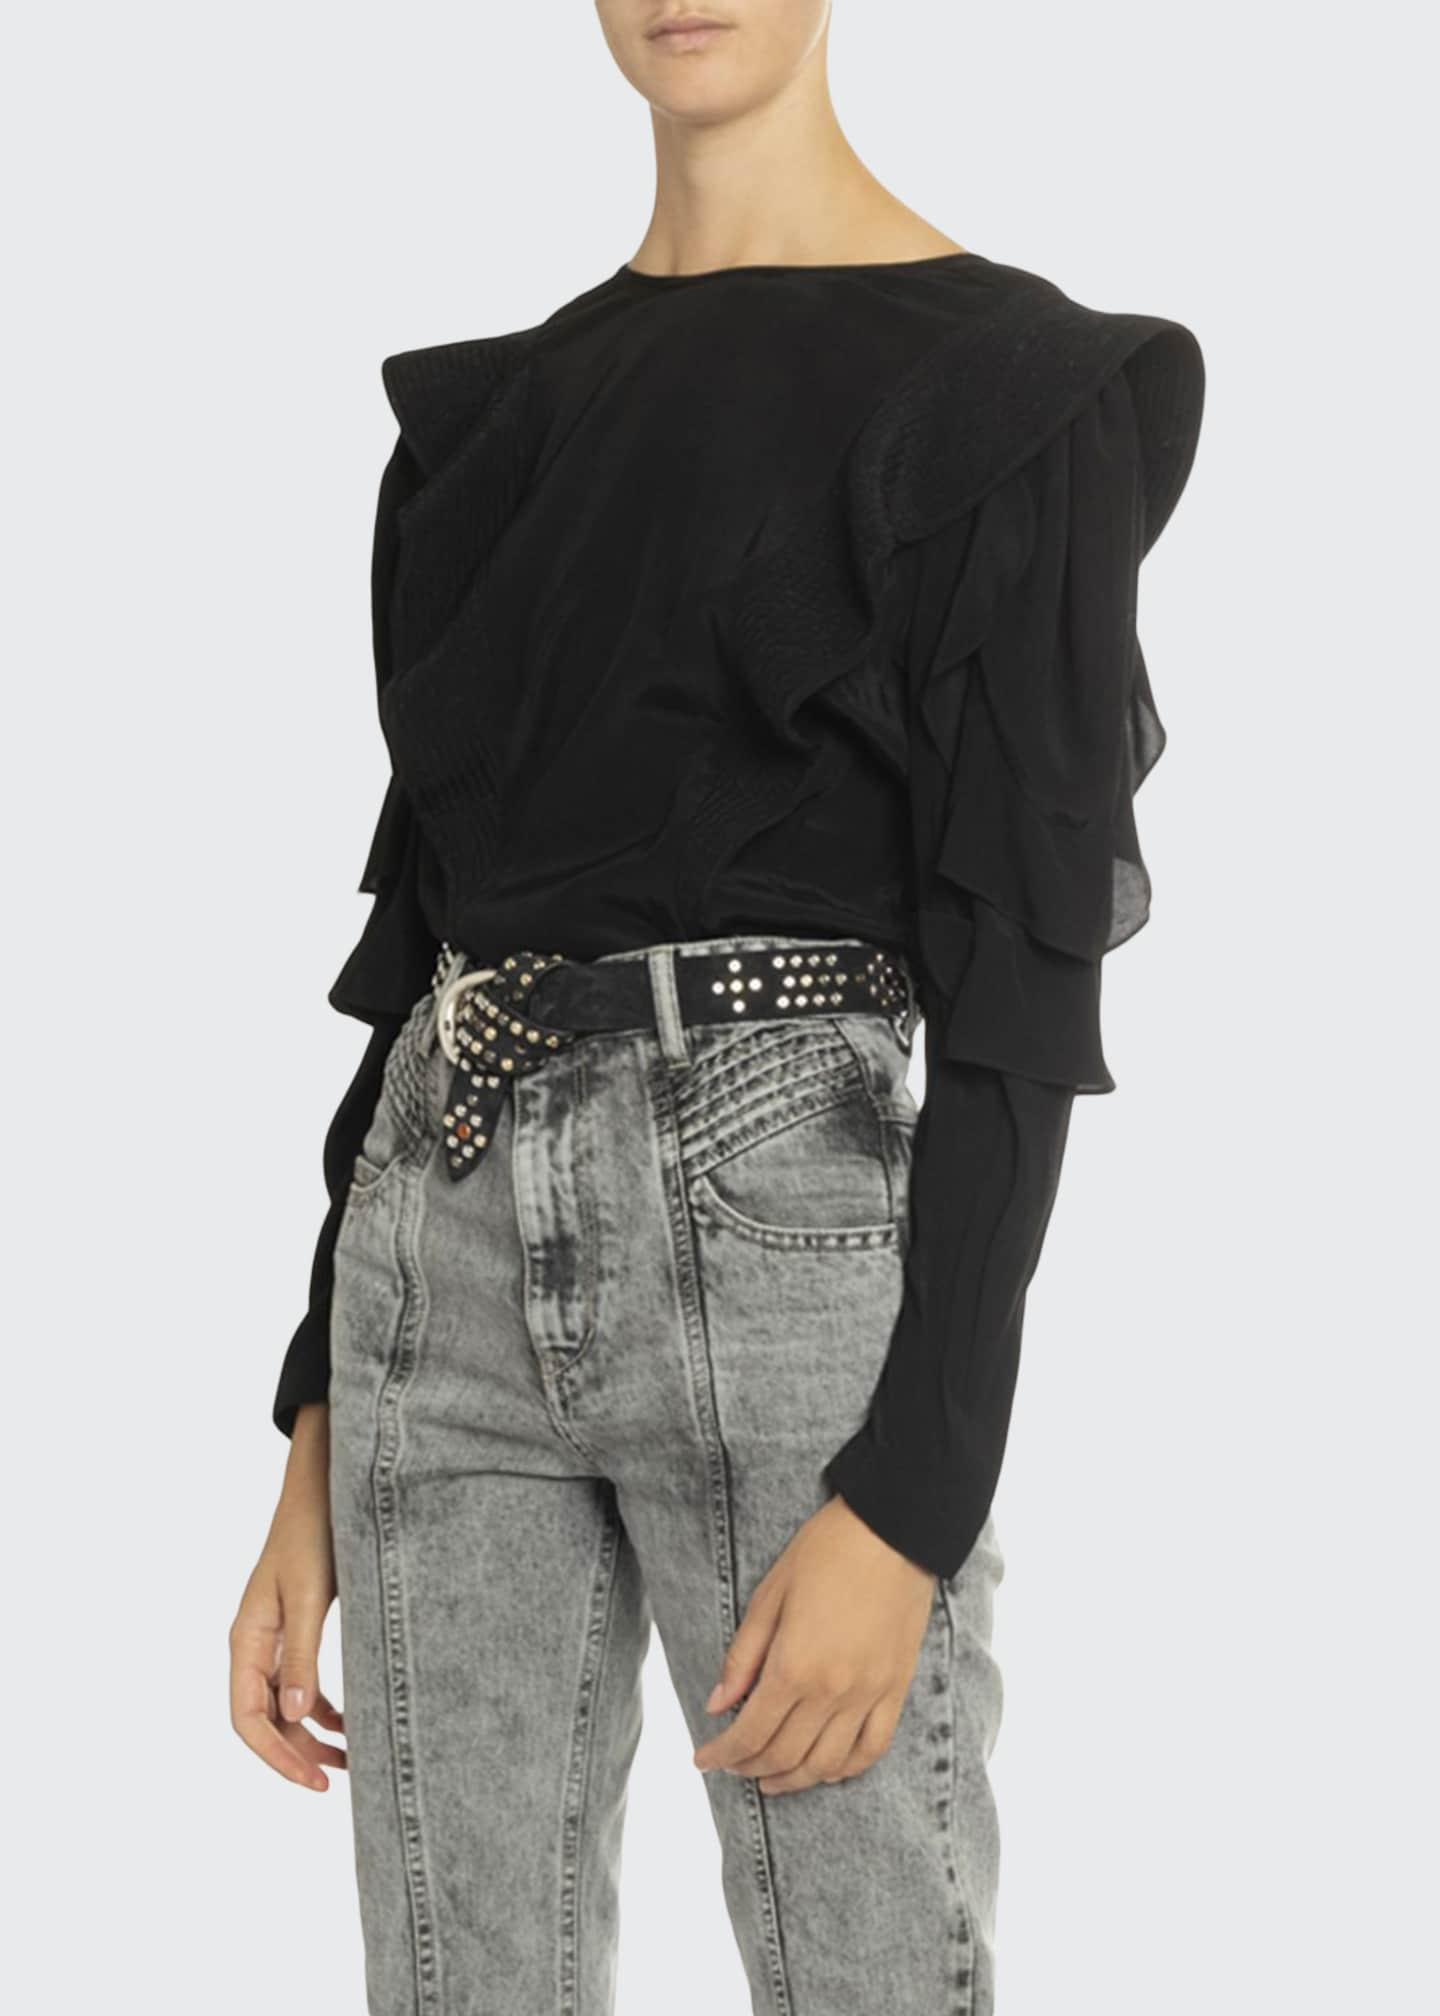 Etoile Isabel Marant Constance Ruffle Long-Sleeve Top